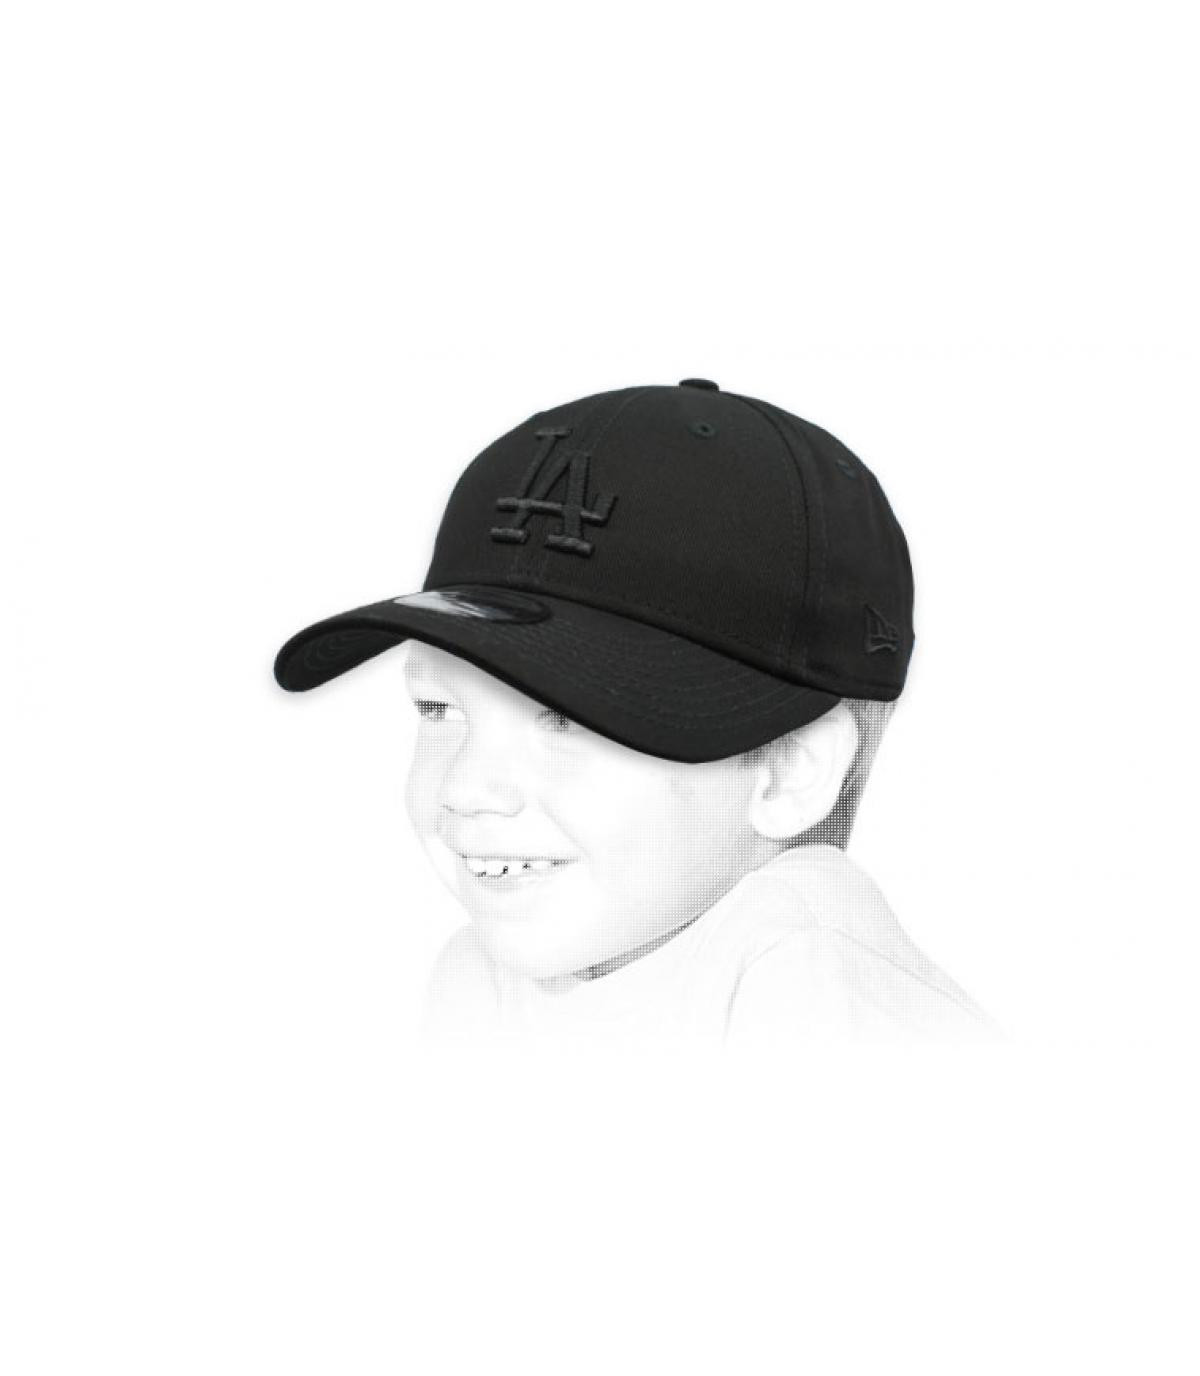 Kinder Cap LA schwarz